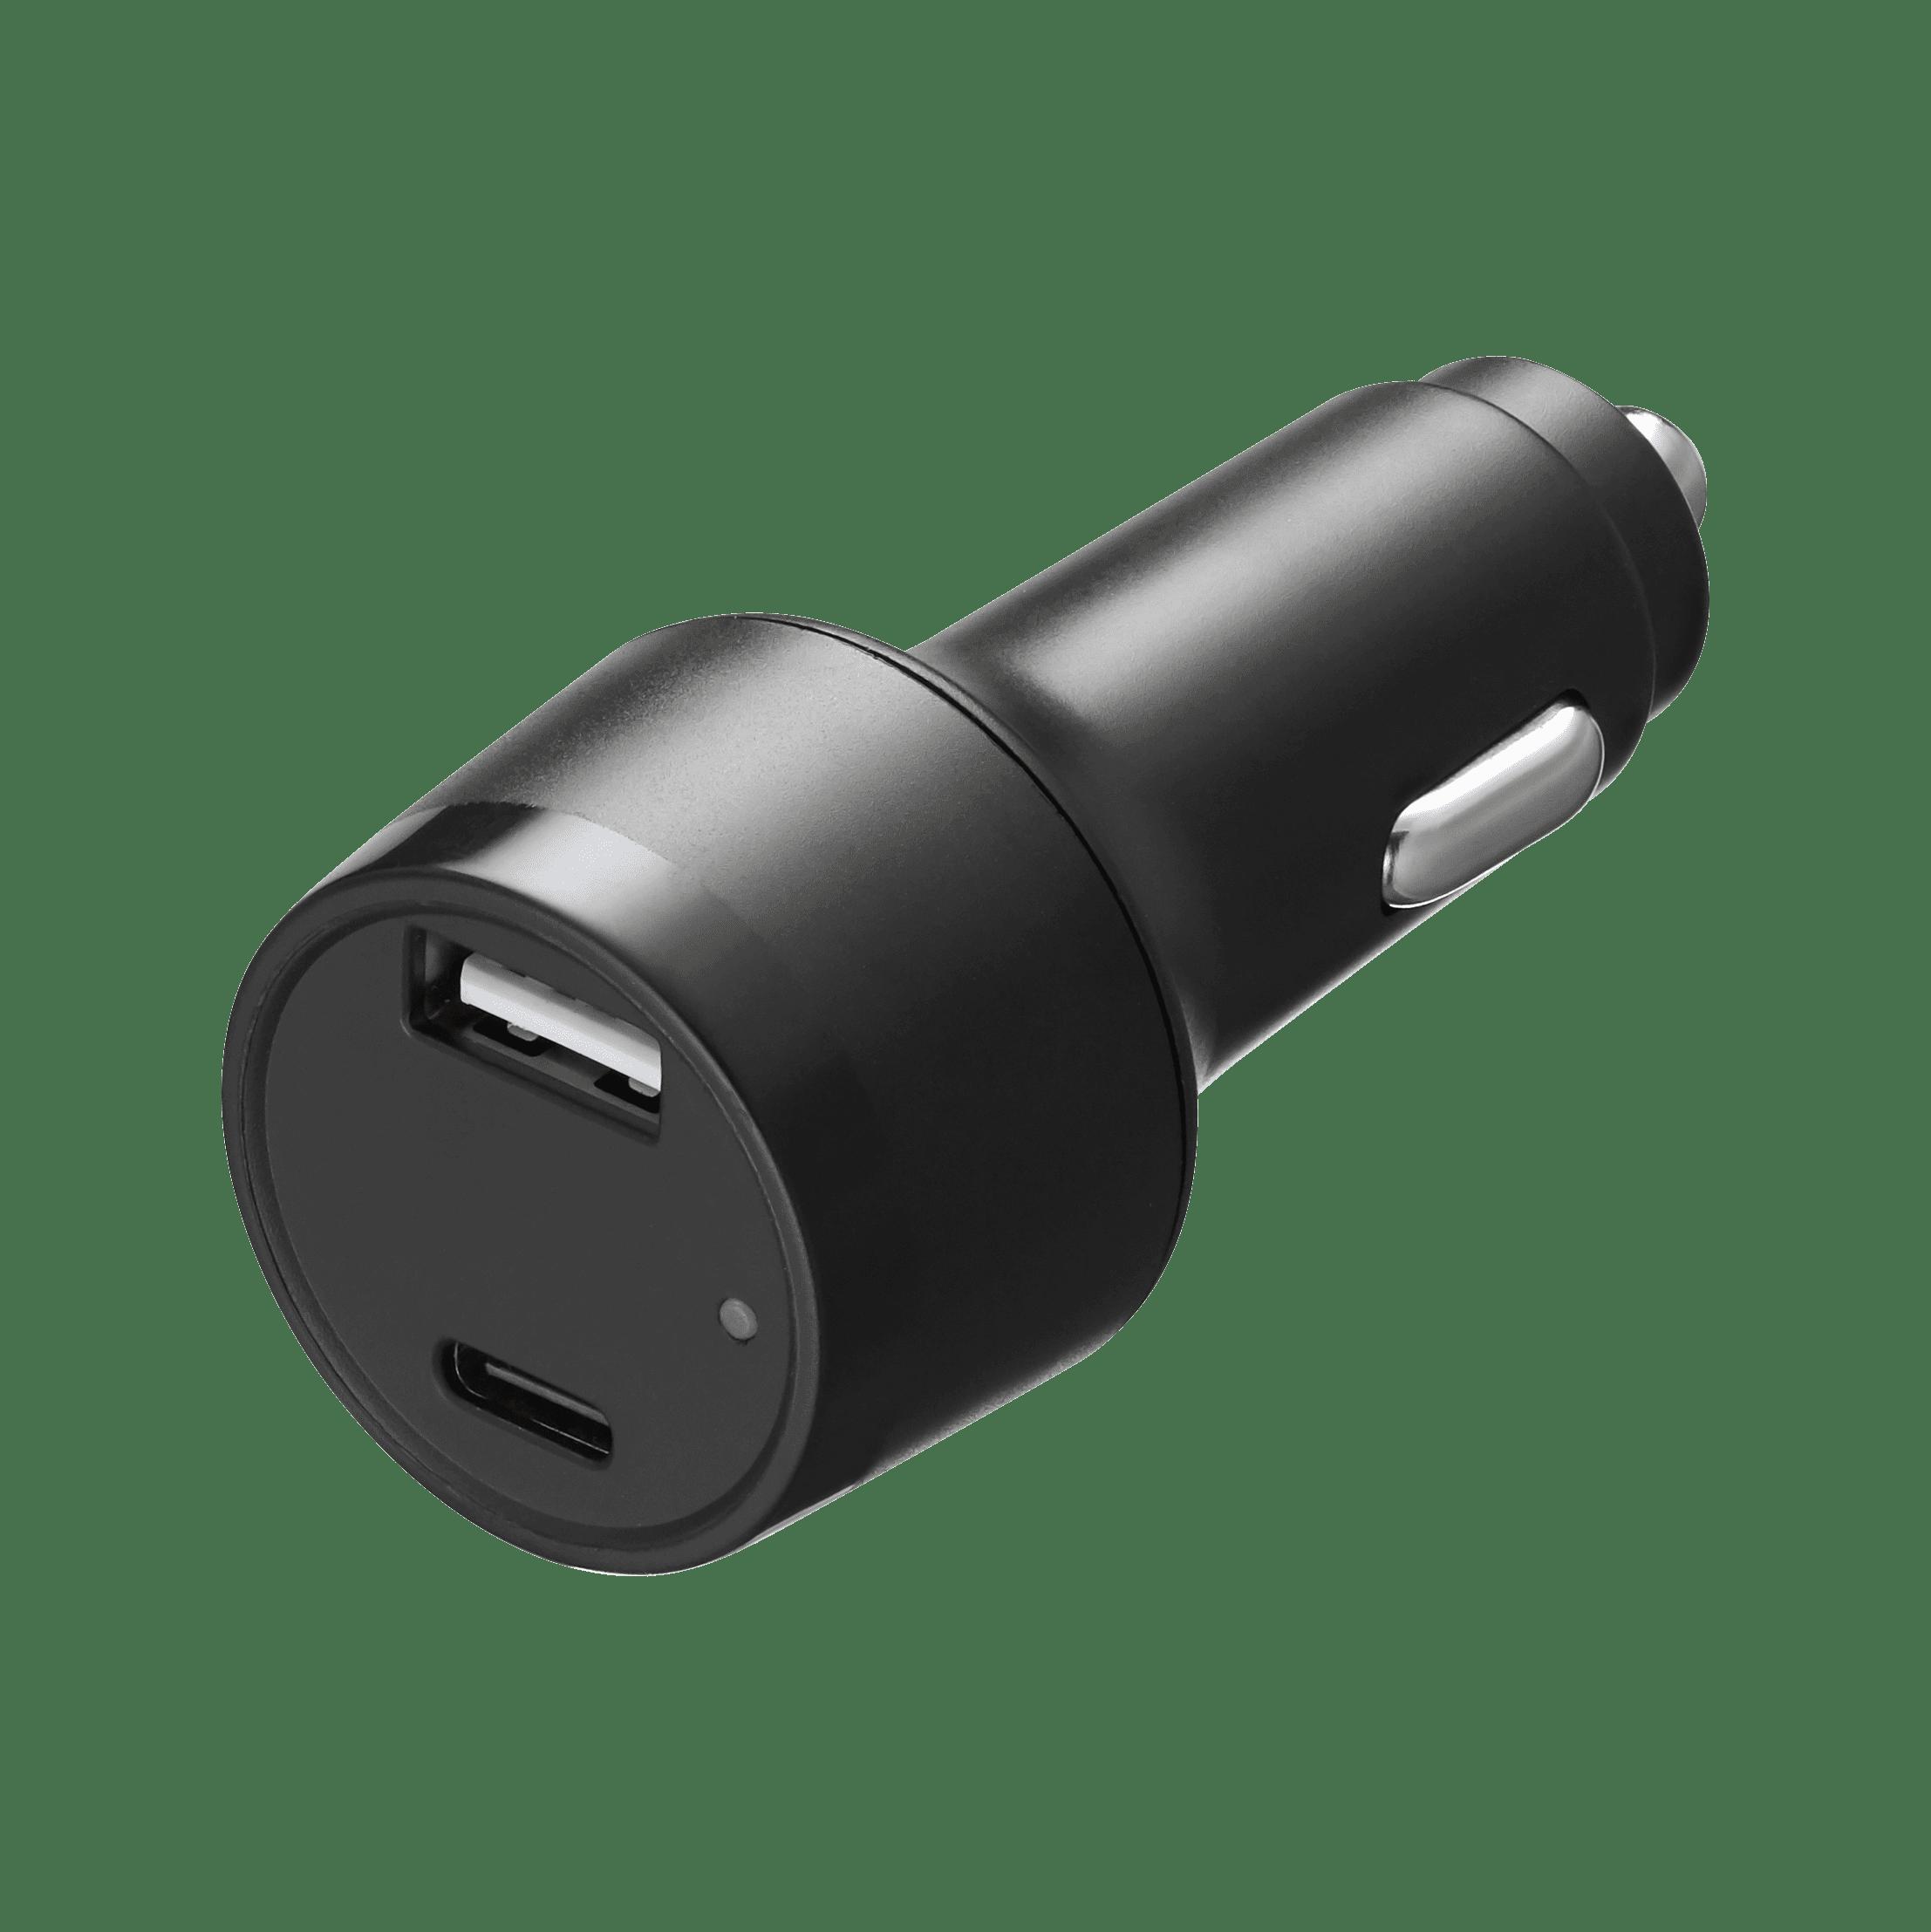 TPD-B42W24B 42W PD  USB C + USB A (2.4A) Type-C Car Charger